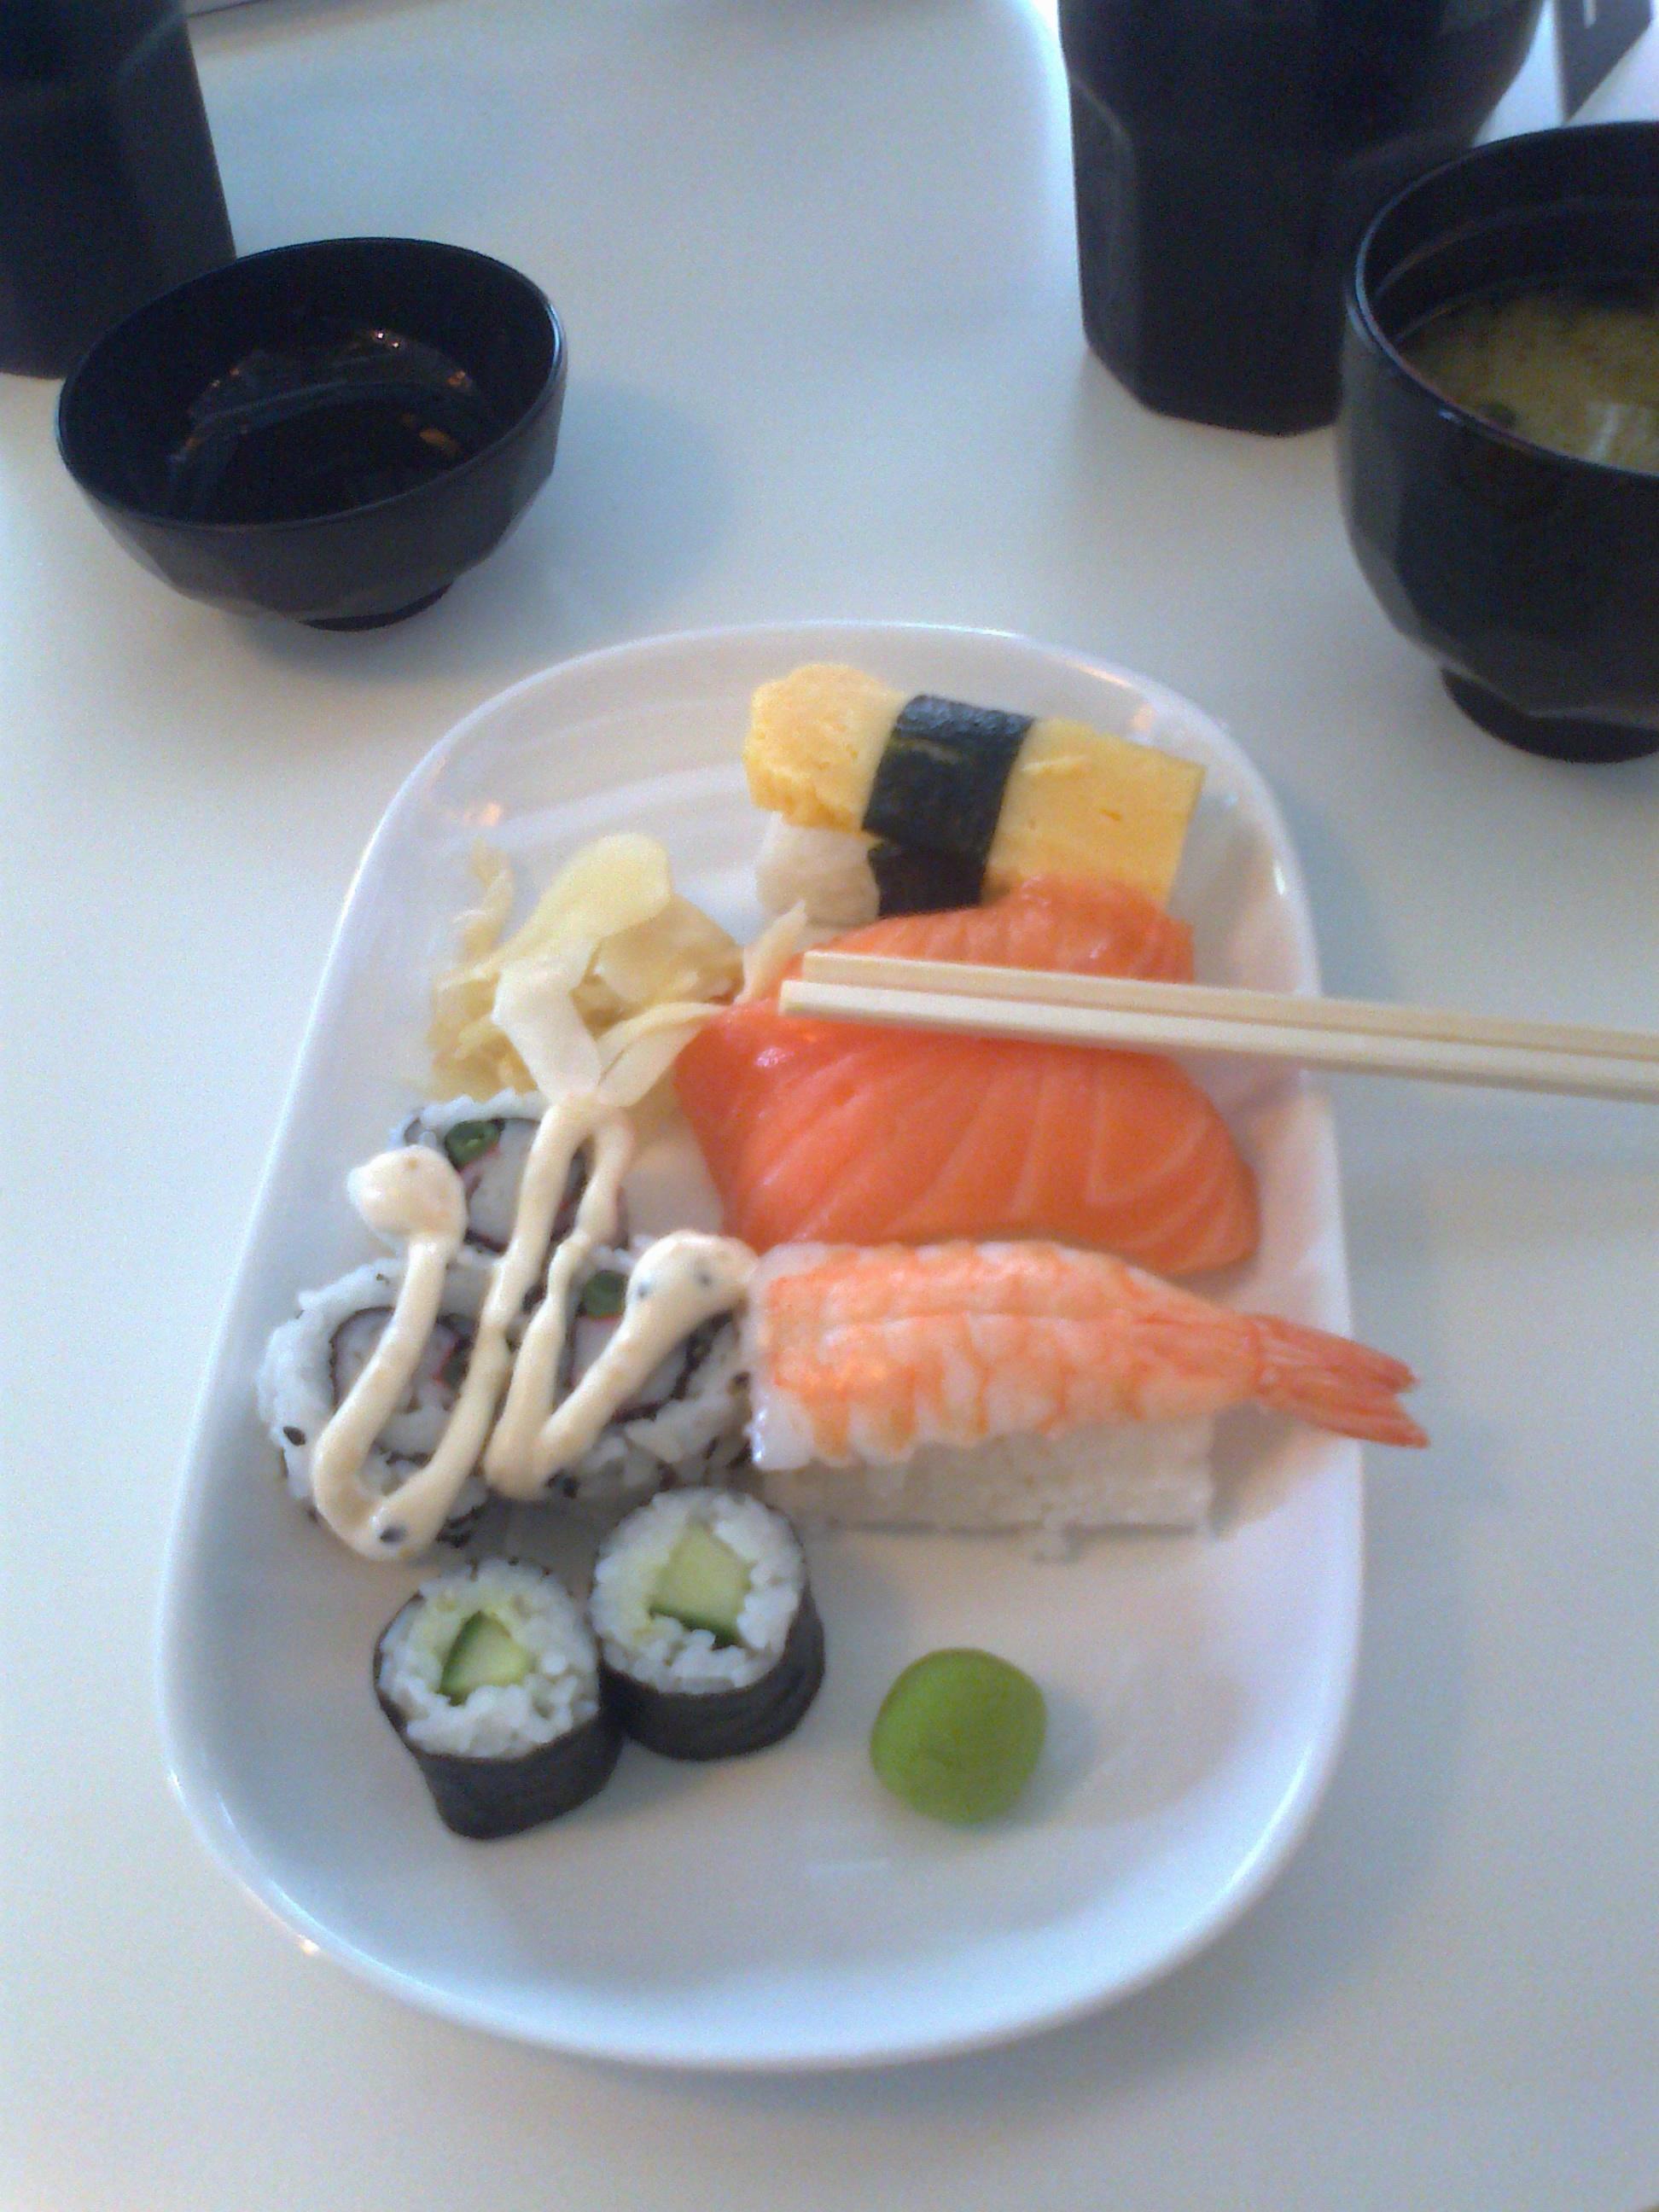 Tiger Sushi Porvoo, Borgå